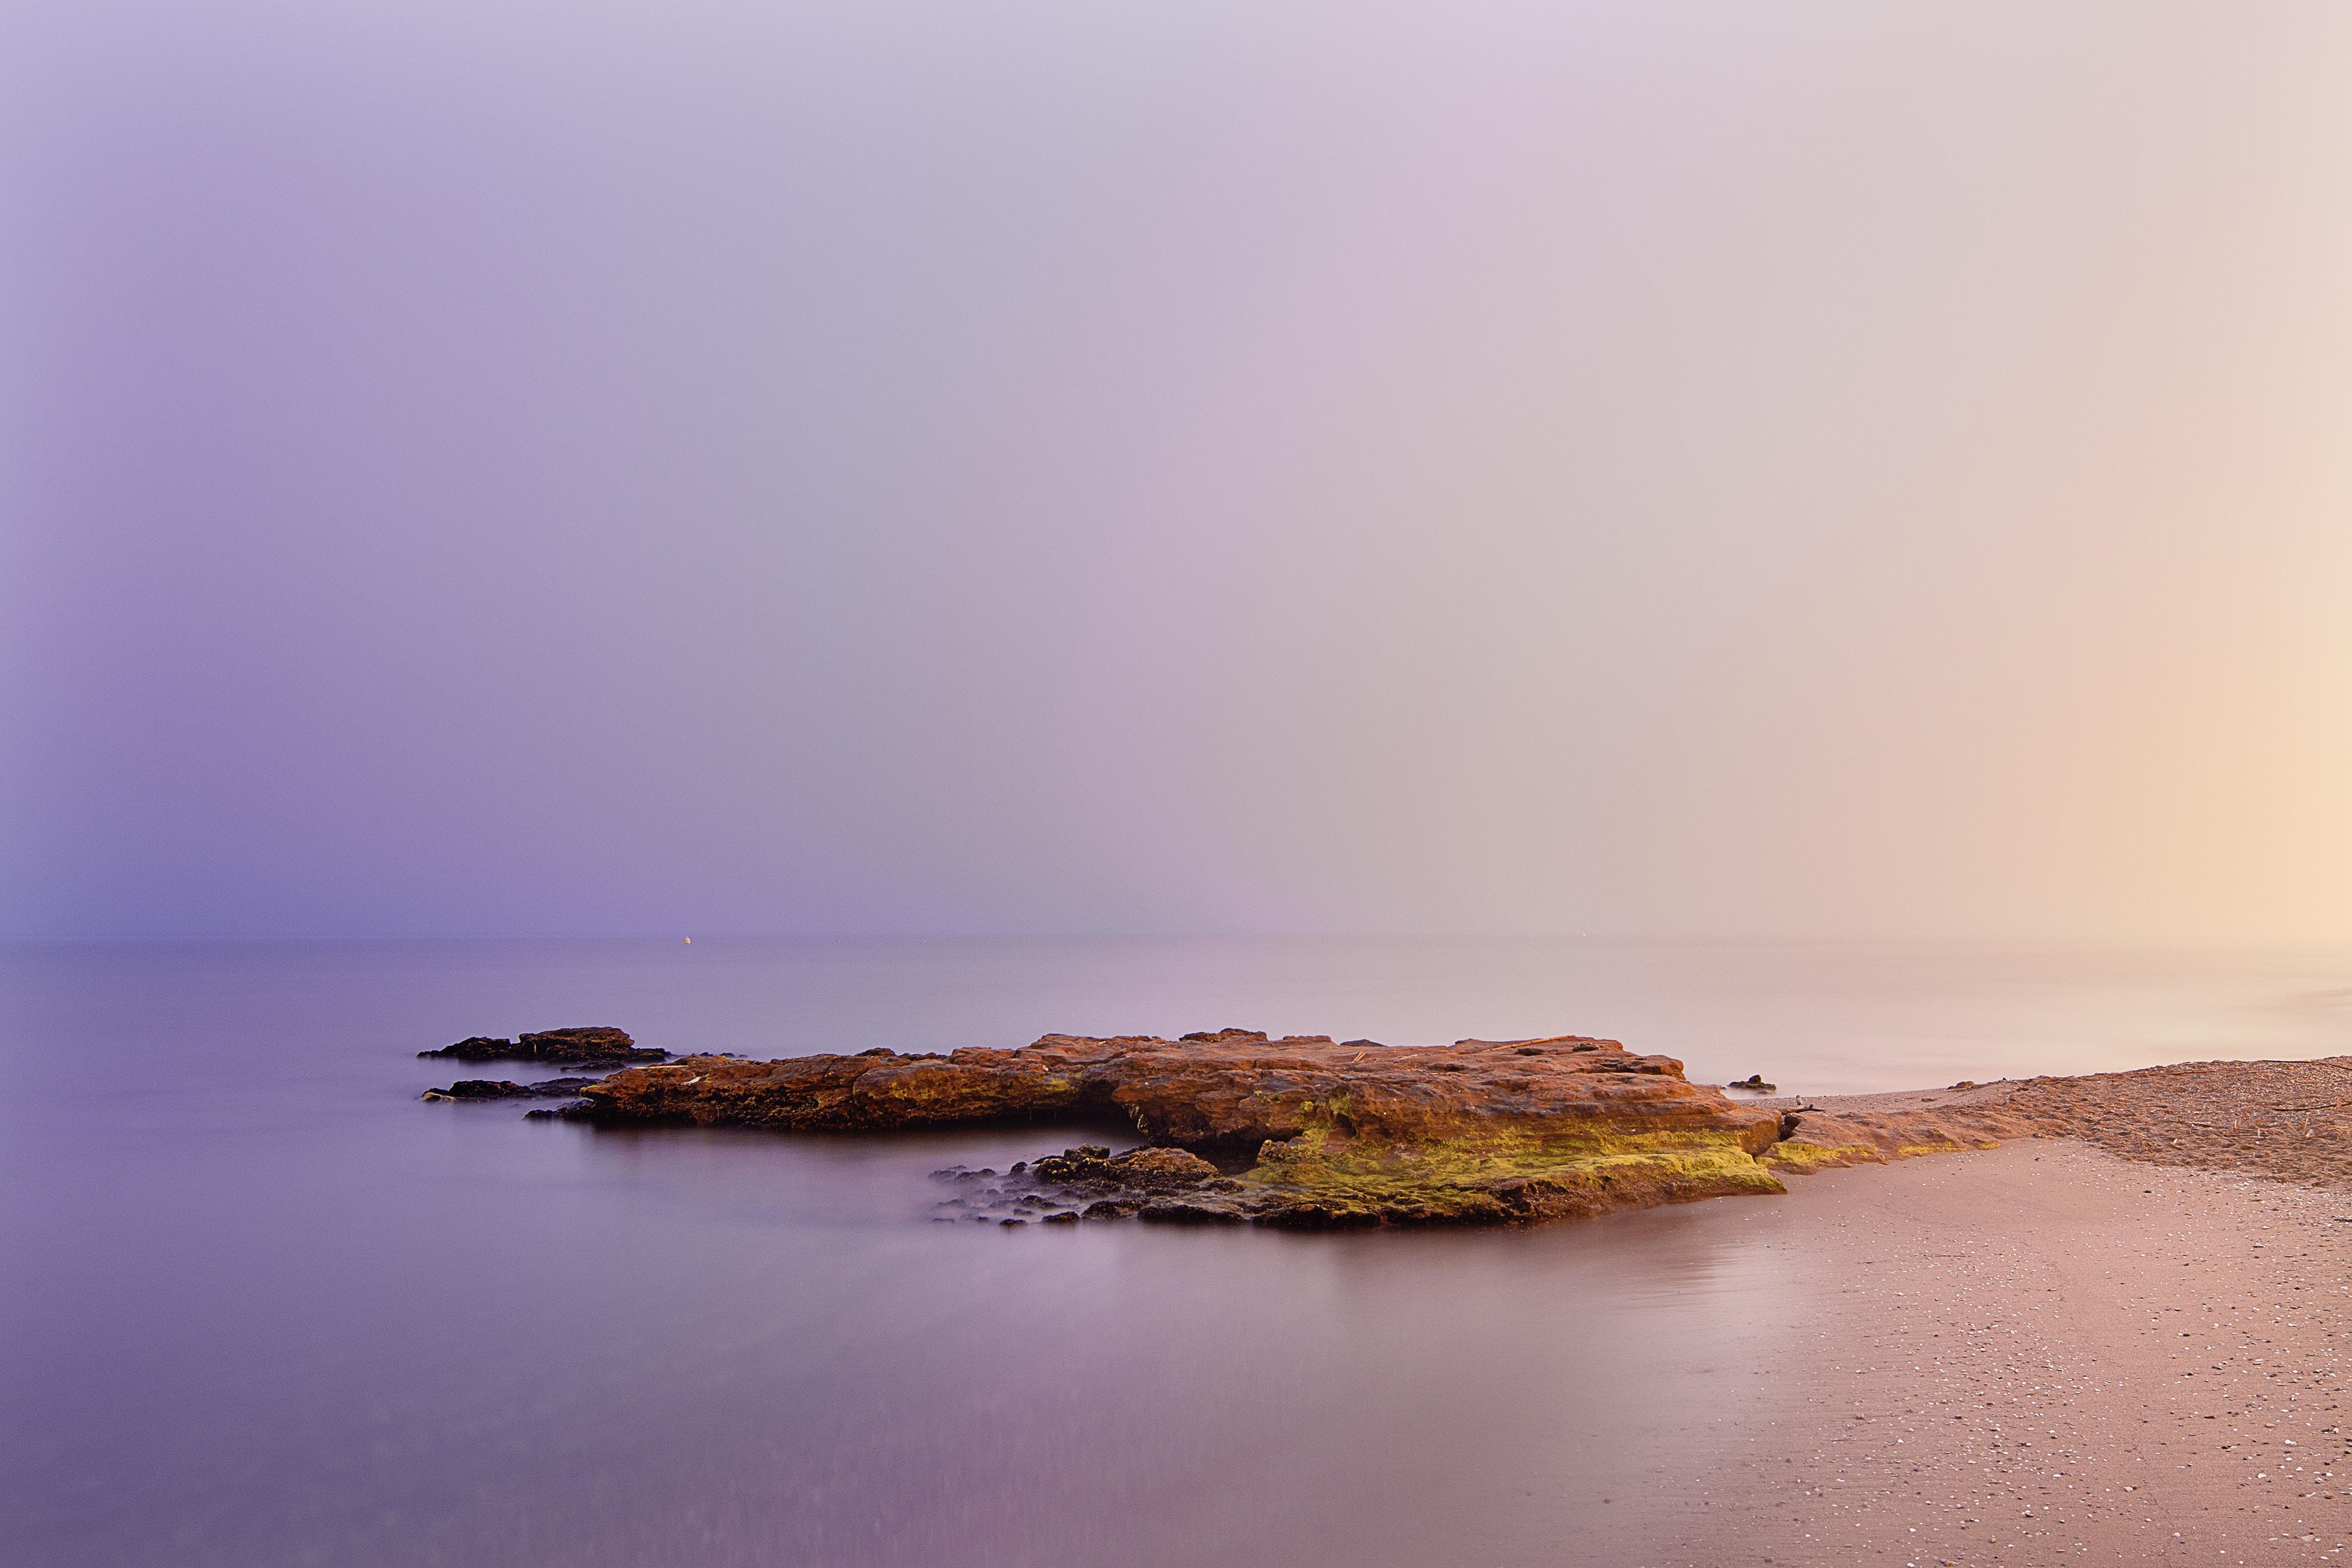 Purple sunrise beams over a rocky ocean formation in Playa de la Misericordia